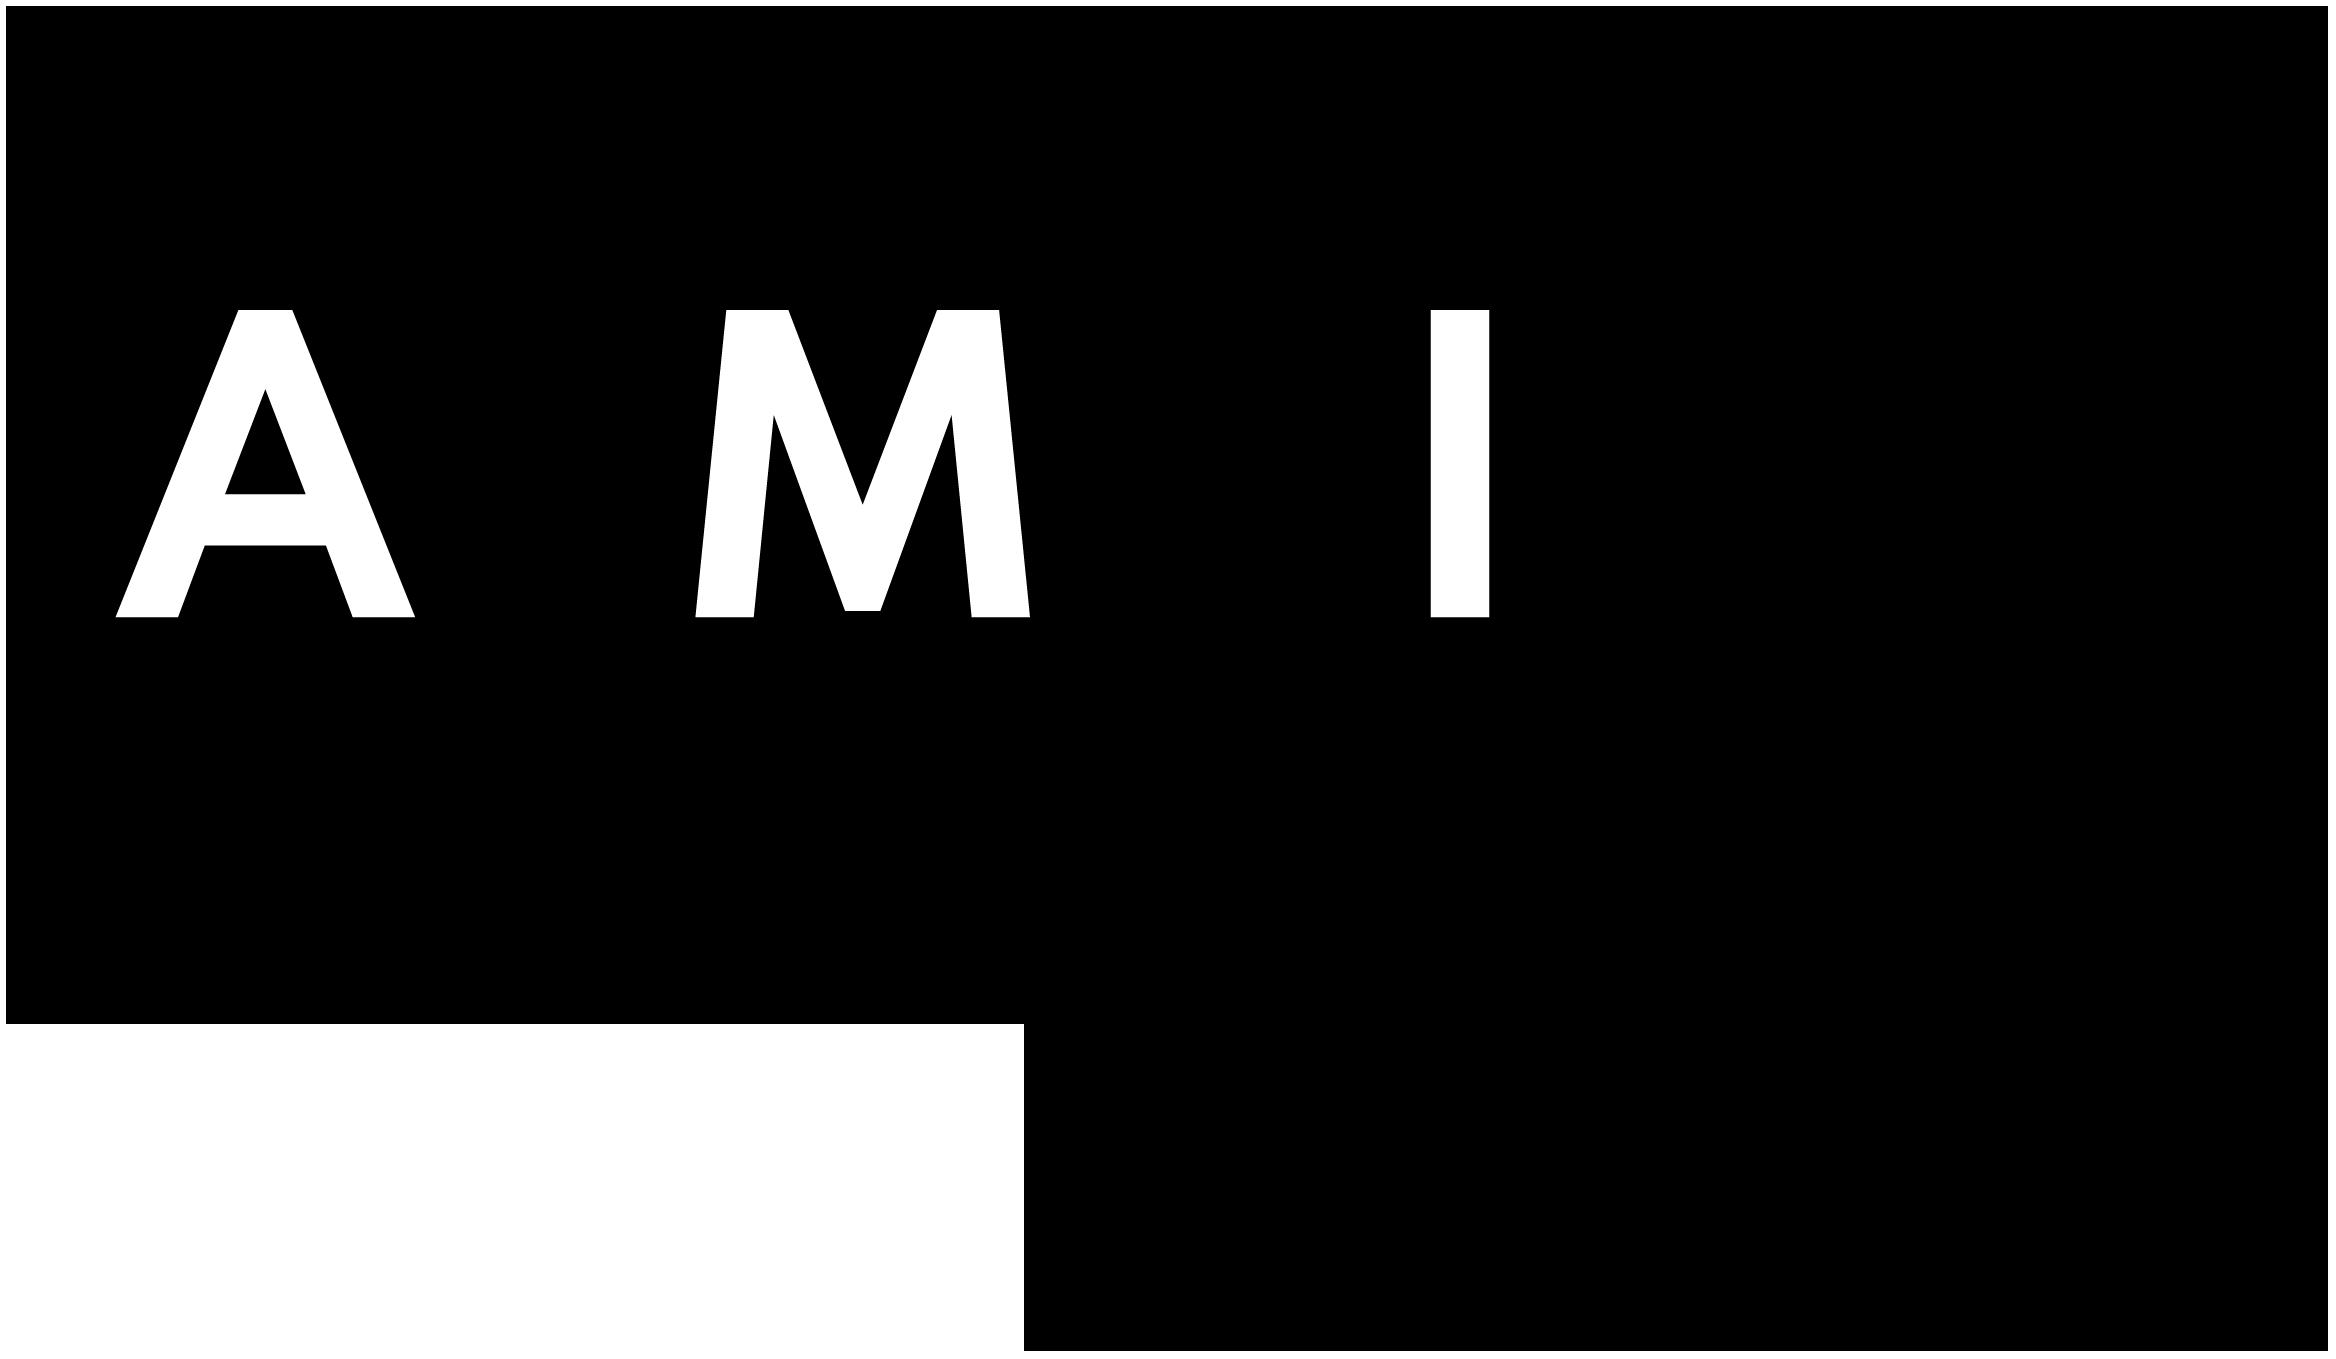 logo-fr-amitele-karine-joly